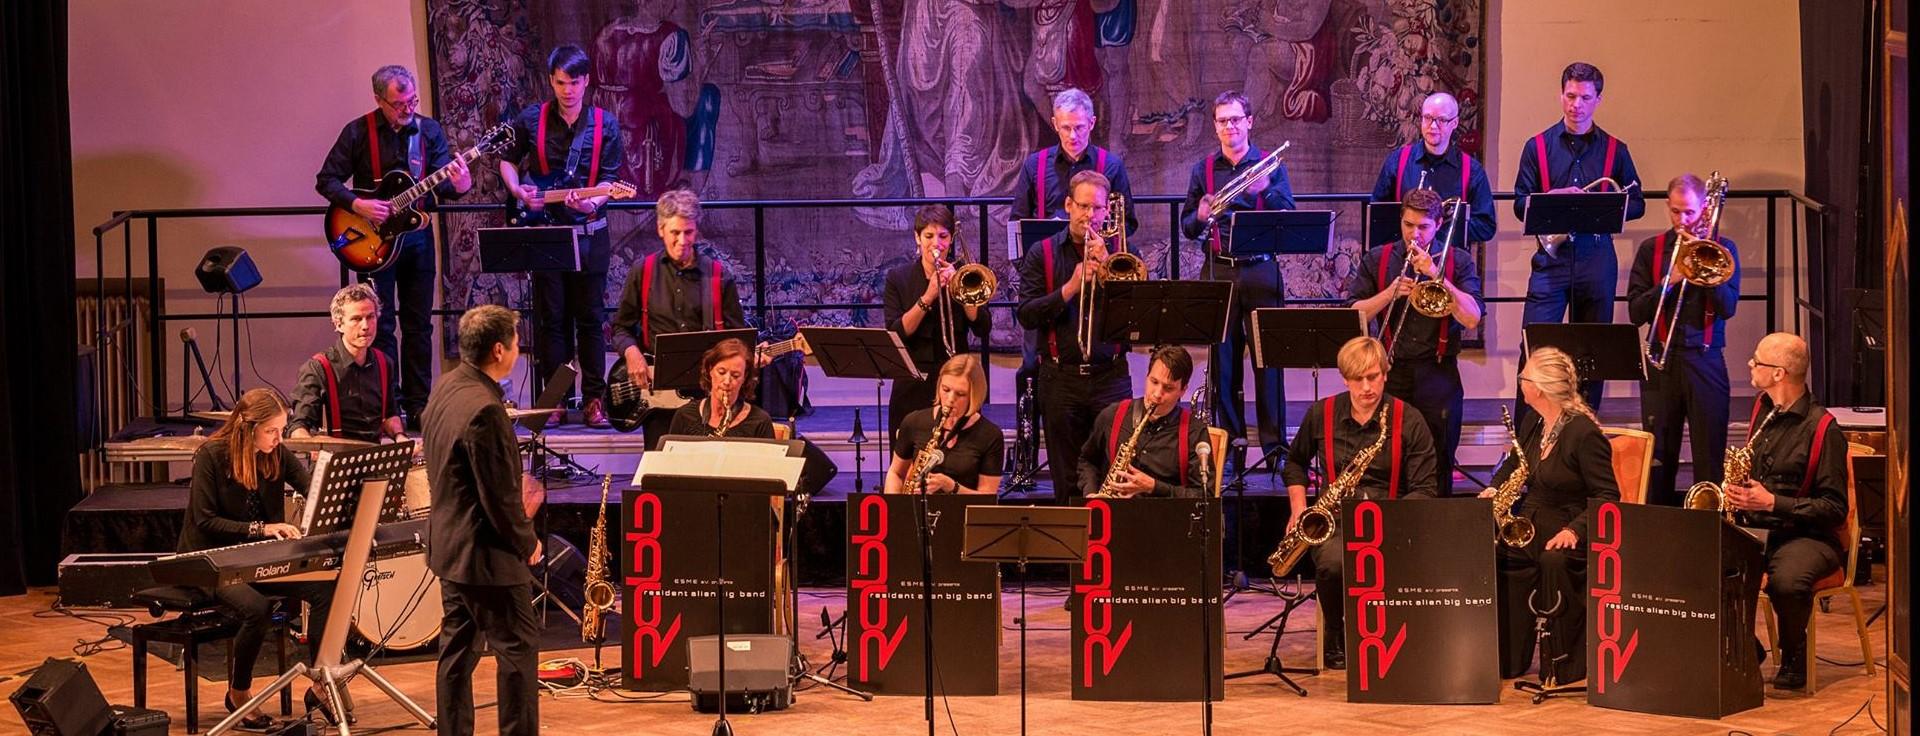 Big Band at Künstlerhaus by Jorge Benitez